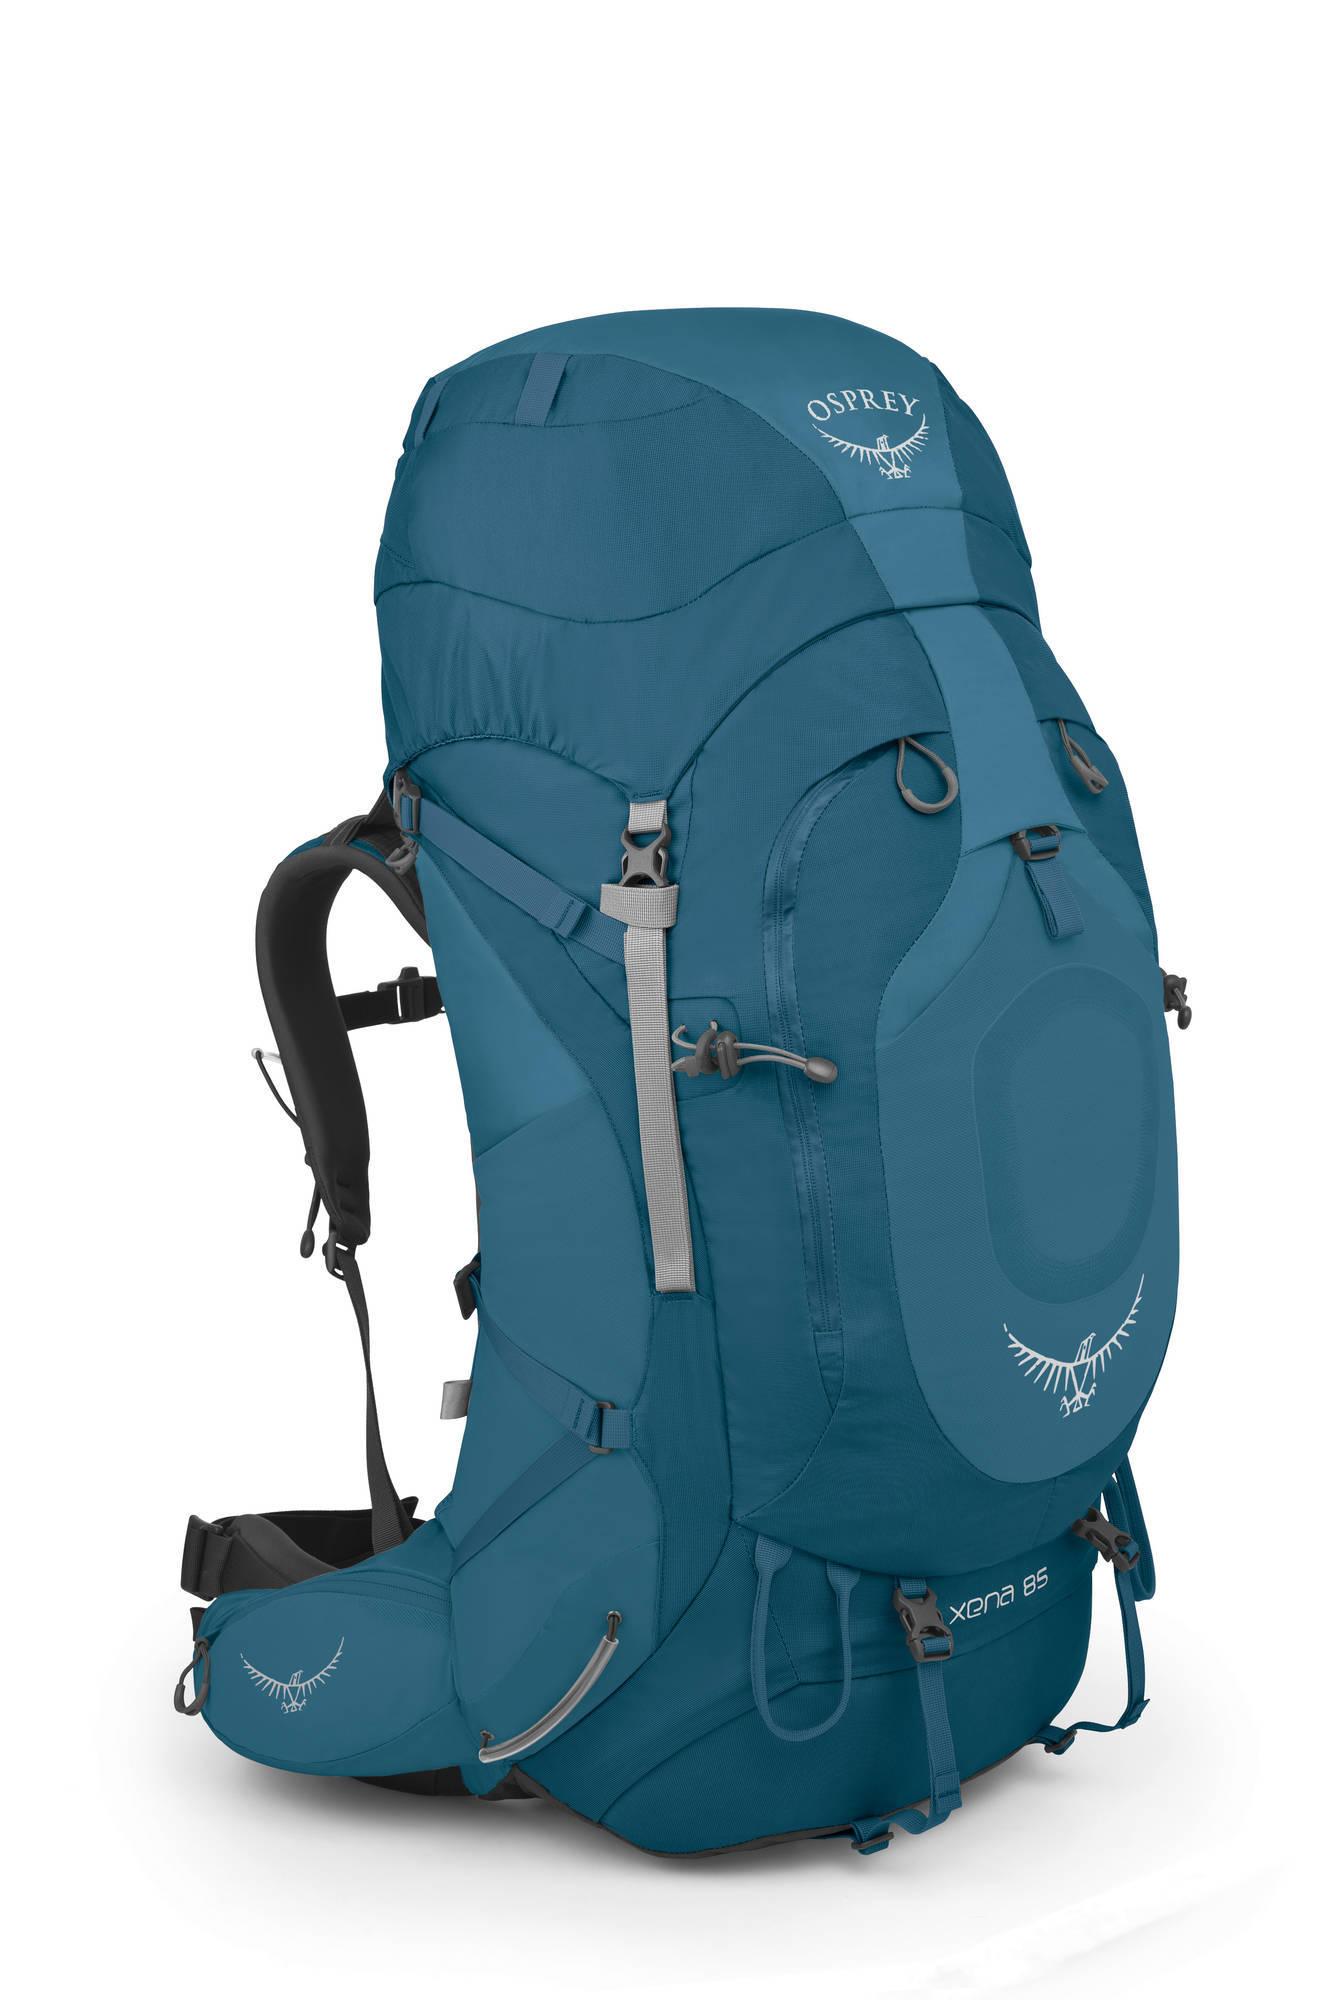 Туристические рюкзаки Рюкзак туристический женский Osprey Xena 85 Xena_85_Side_Sky_Blue_web.jpg